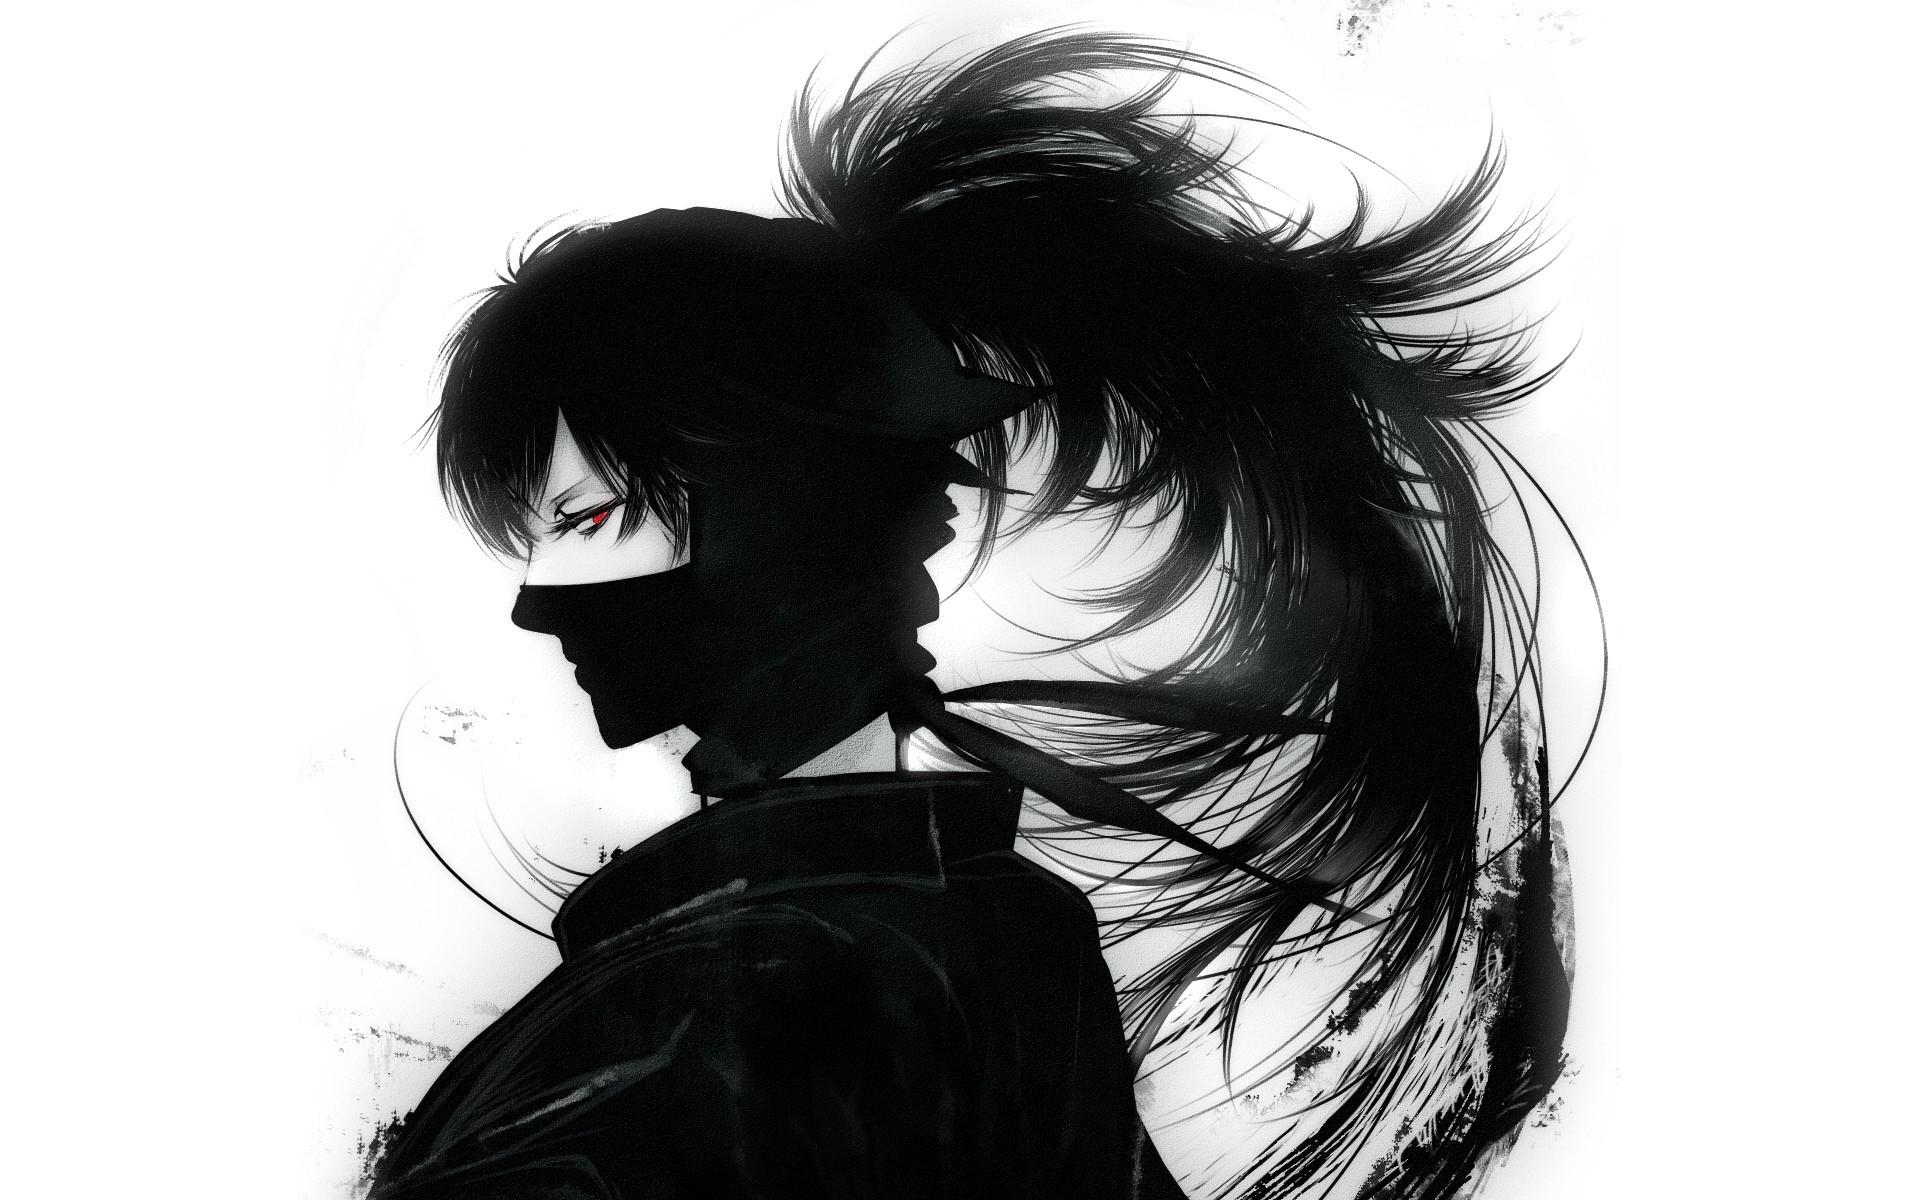 Anime Ninja Wallpaper Cool Photos #e6kc0uul